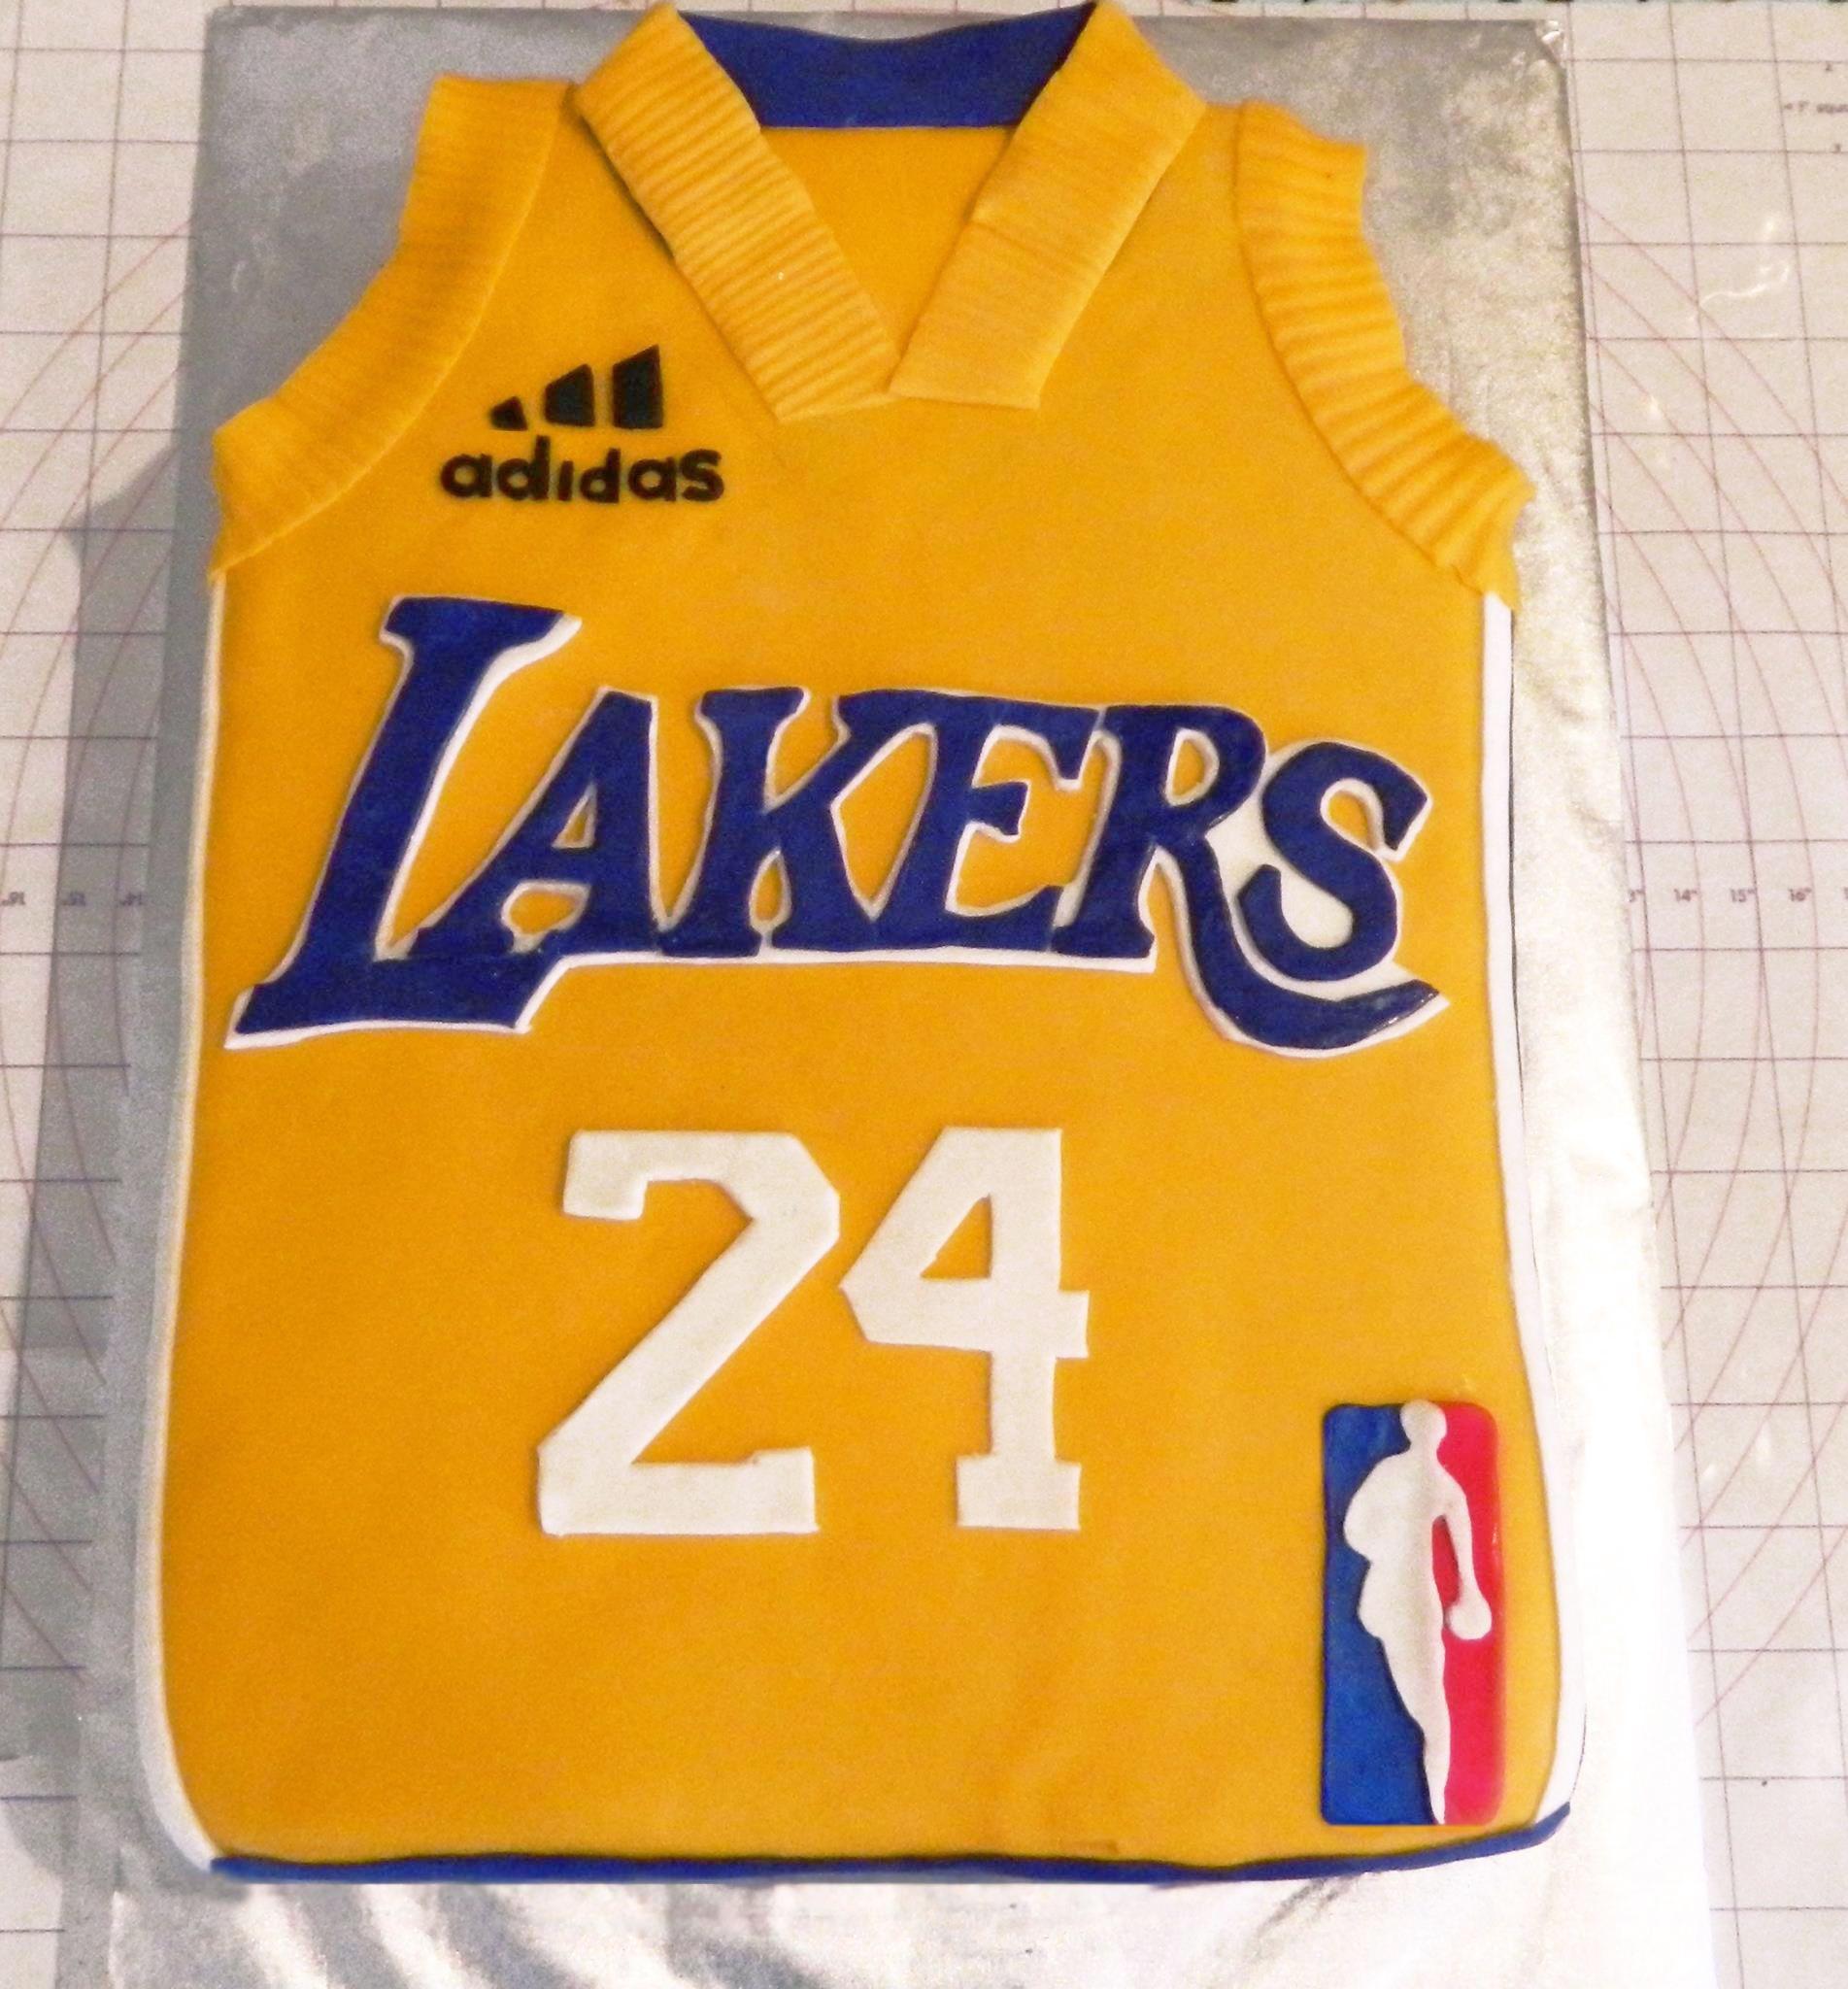 Lakers — Basketball / NBA Cake designs for boy